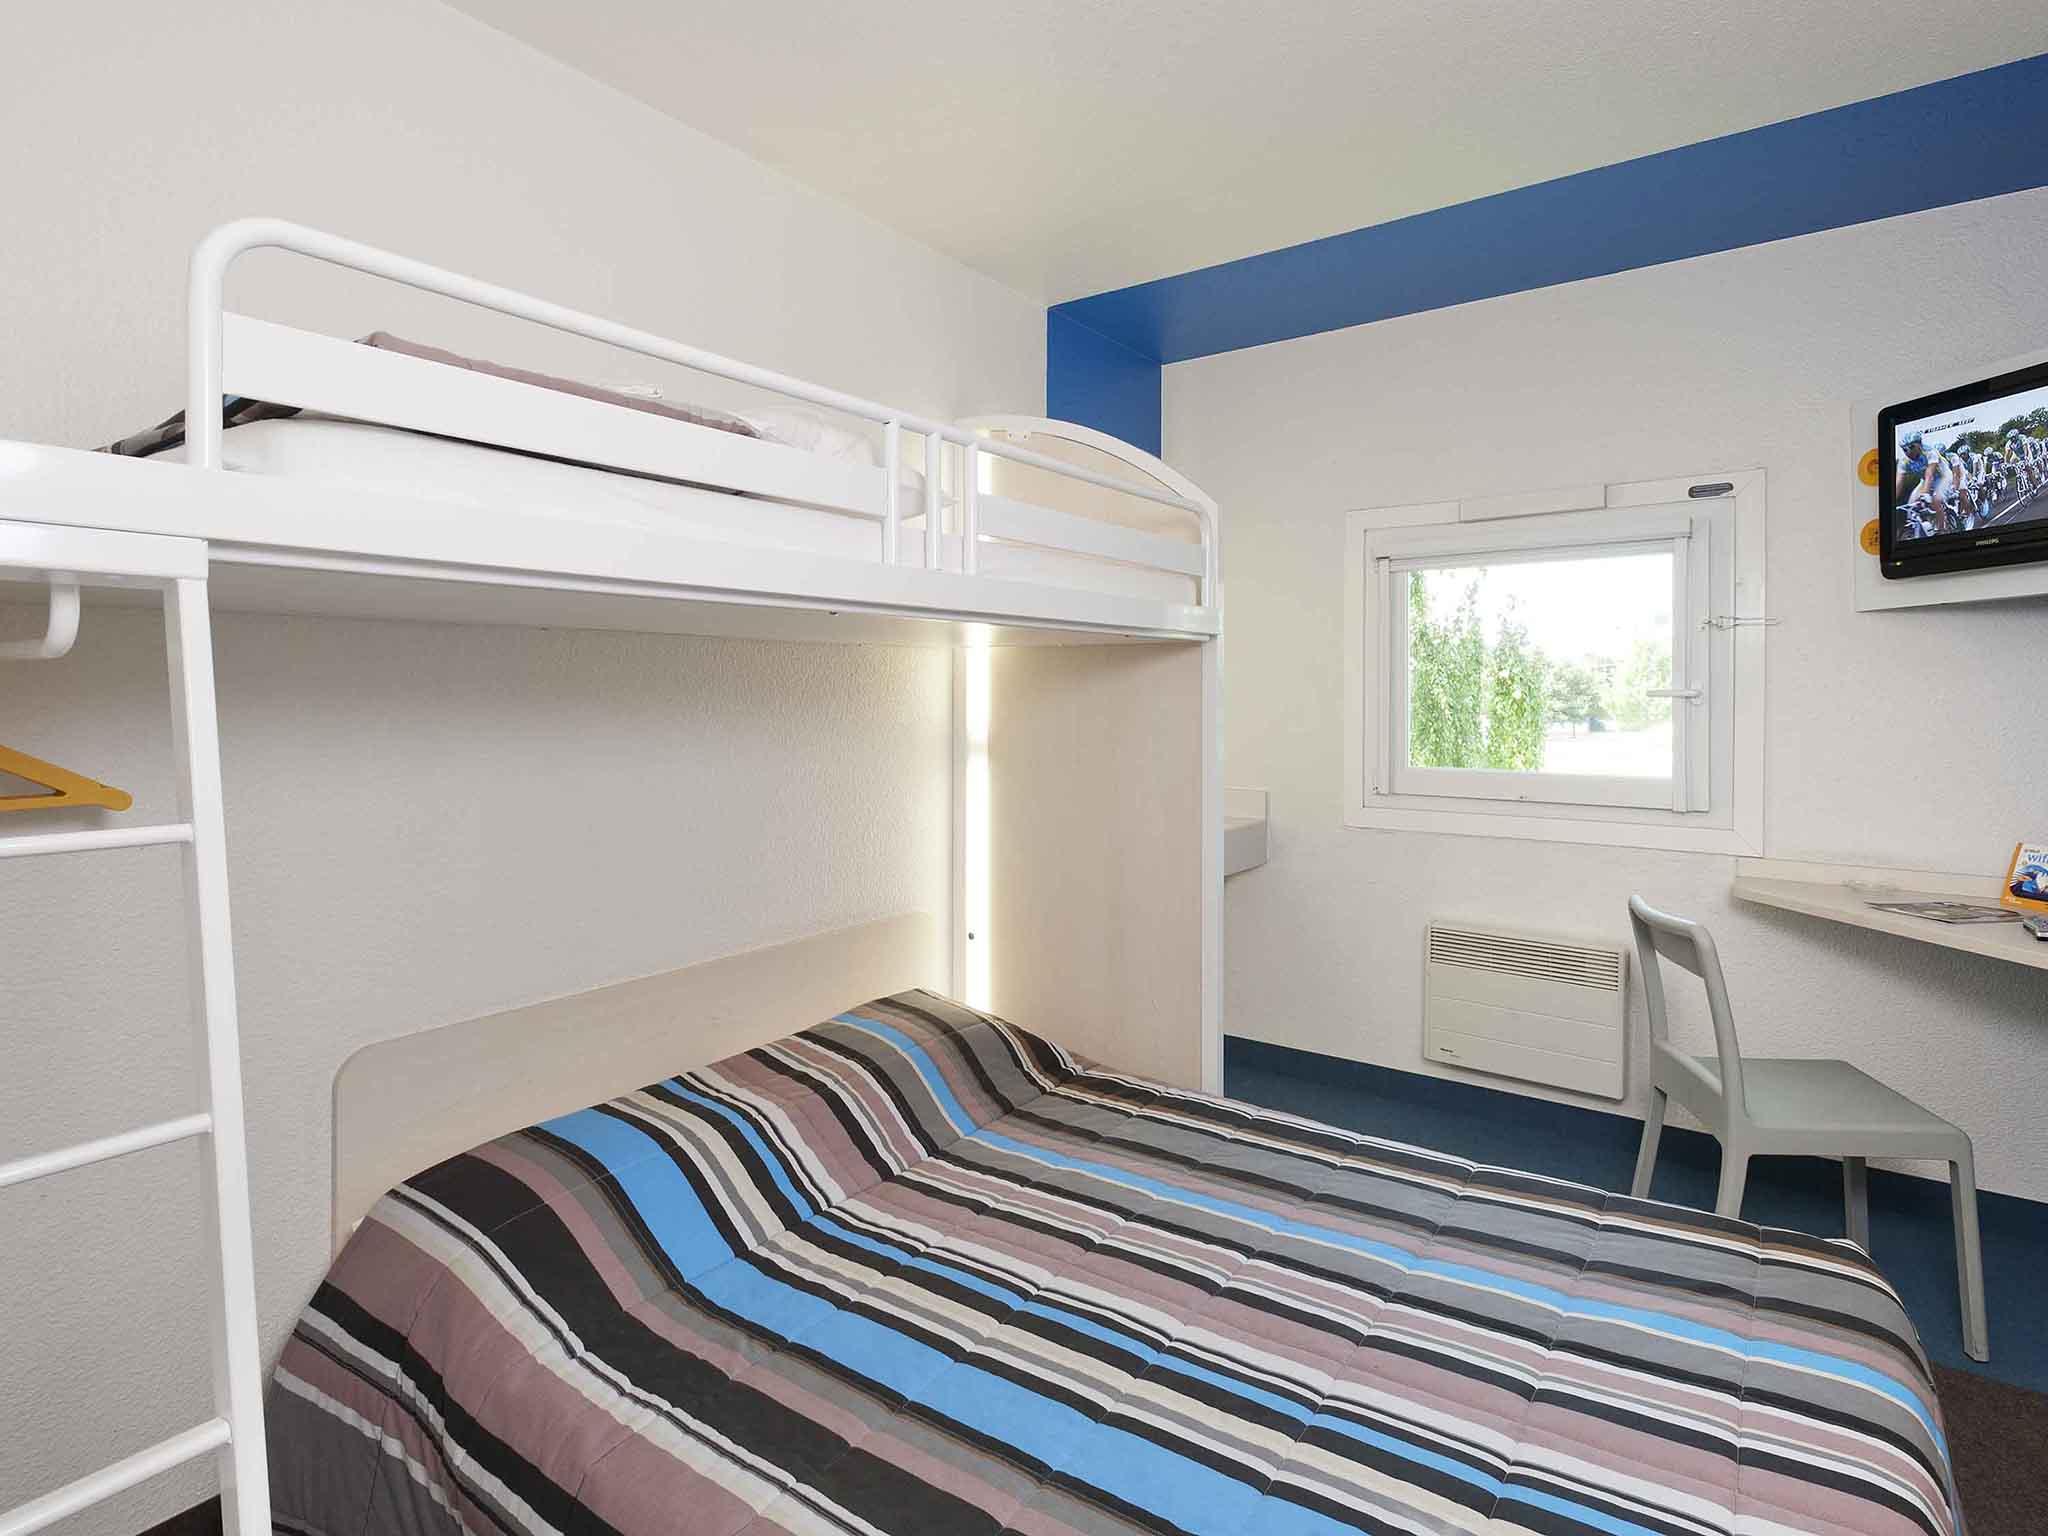 Hotel – hotelF1 Dunkerque Centre Saint-Pol-sur-Mer